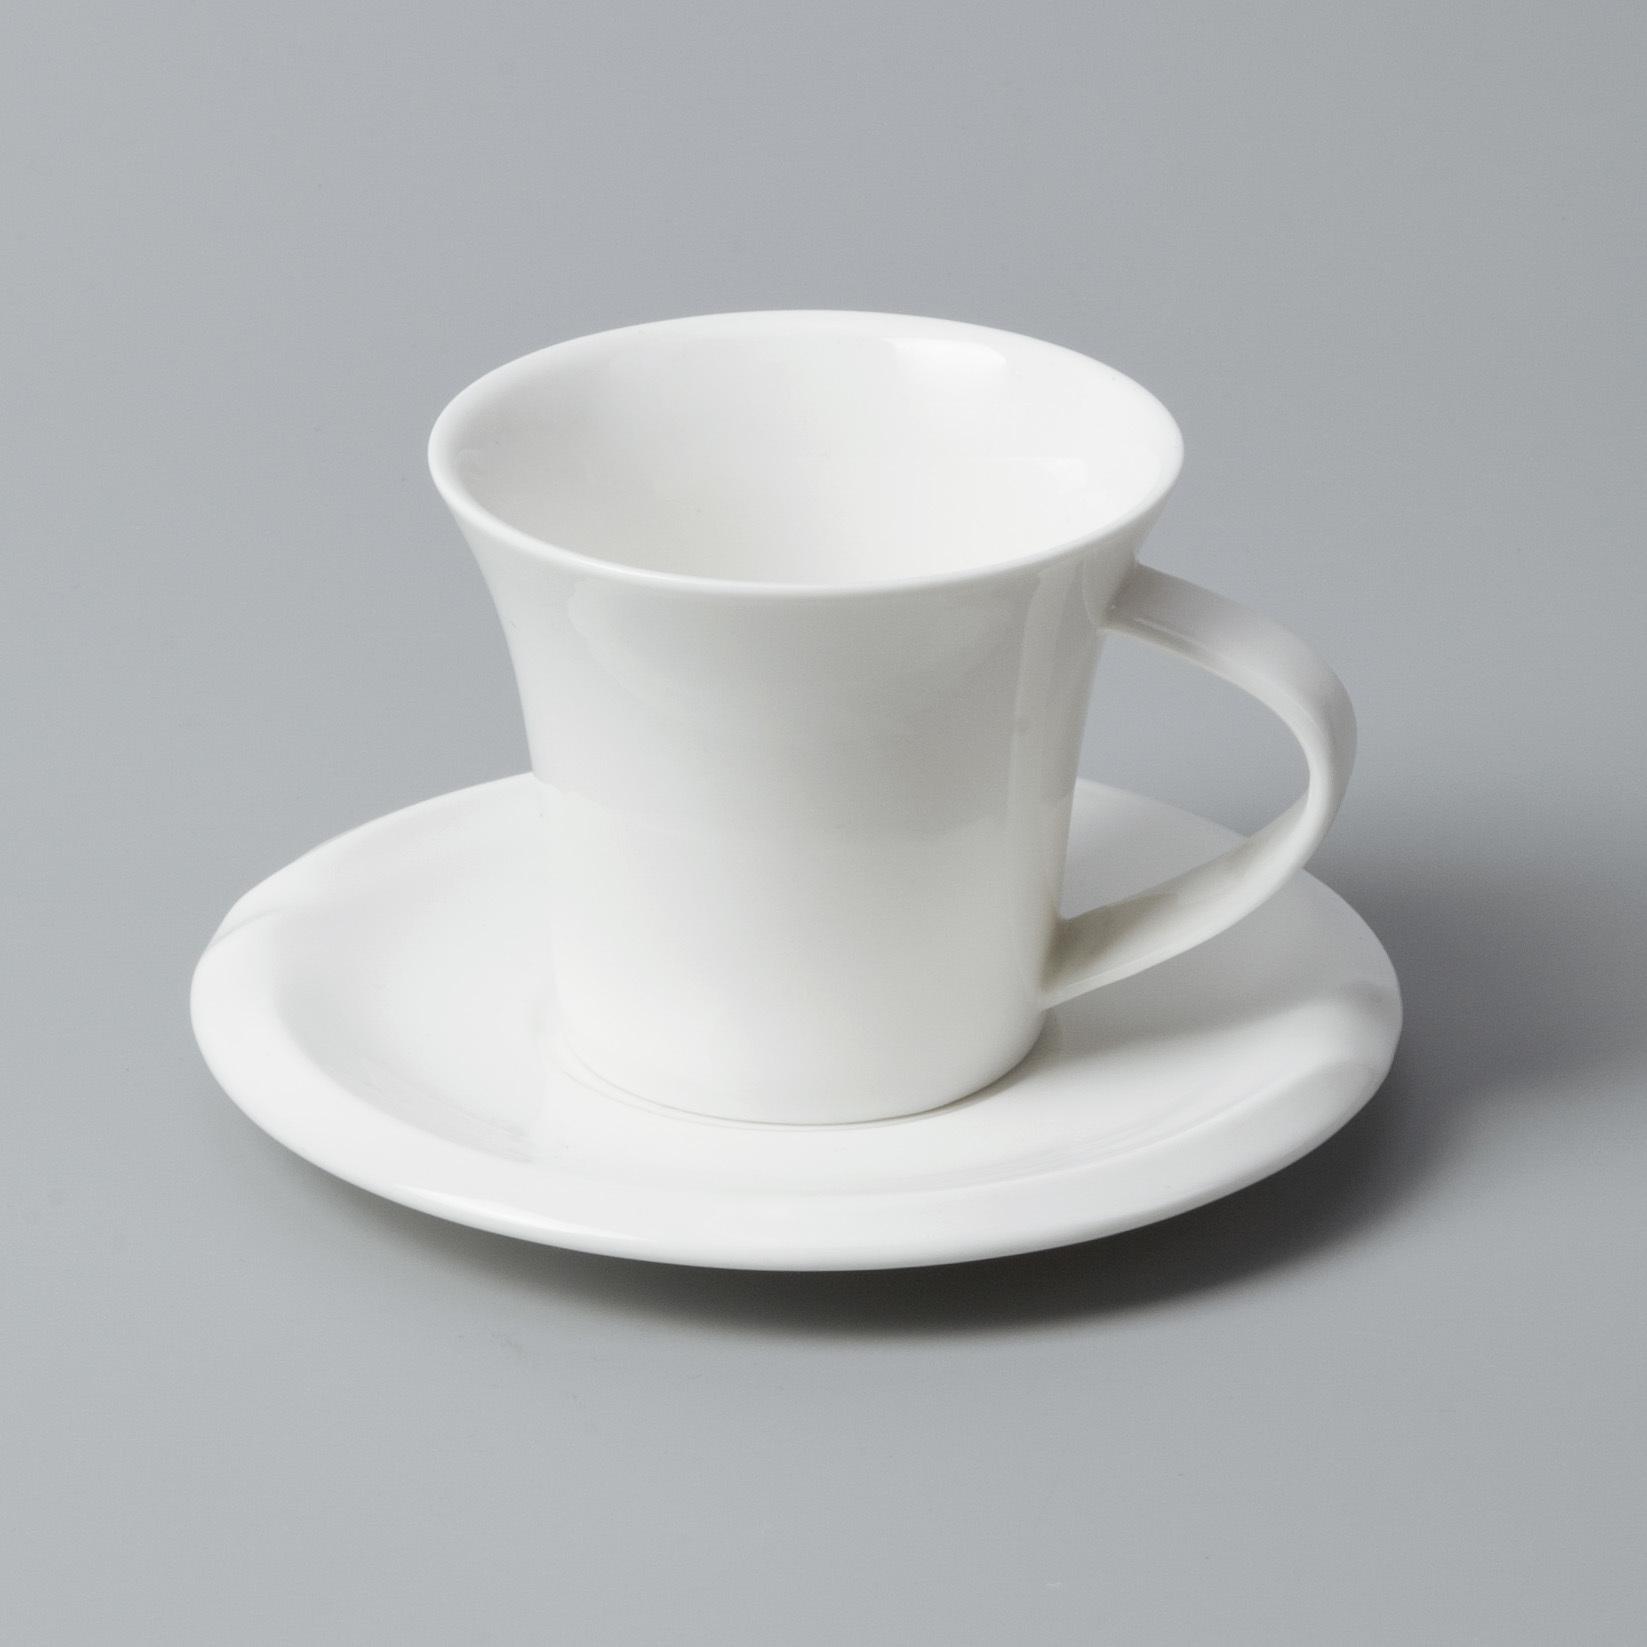 Two Eight Brand color stock white porcelain tableware vietnamese